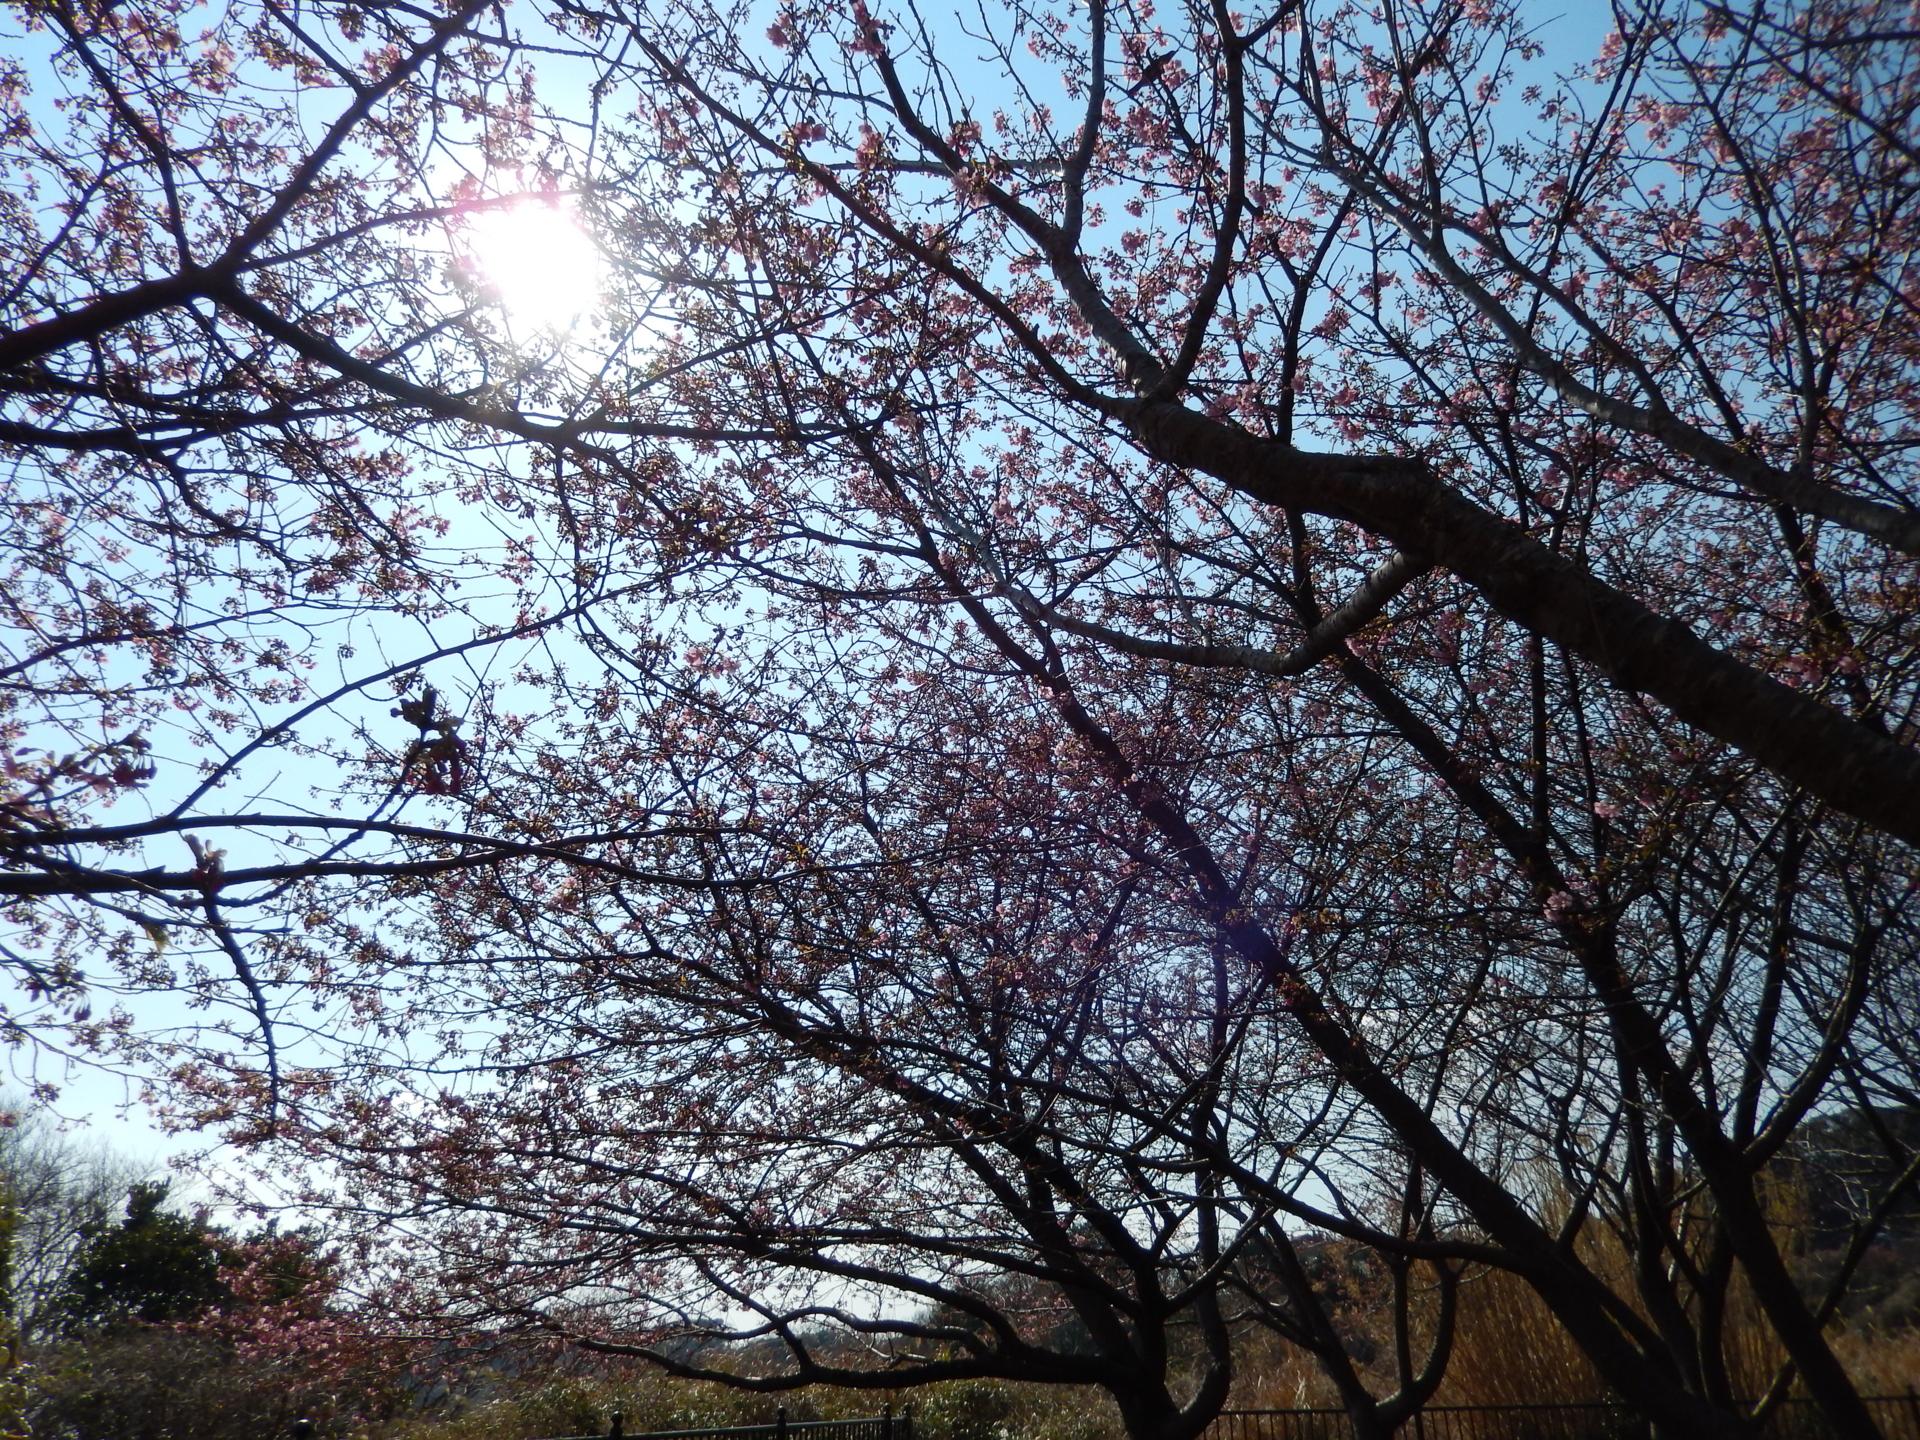 f:id:ToshUeno:20150215125255j:plain